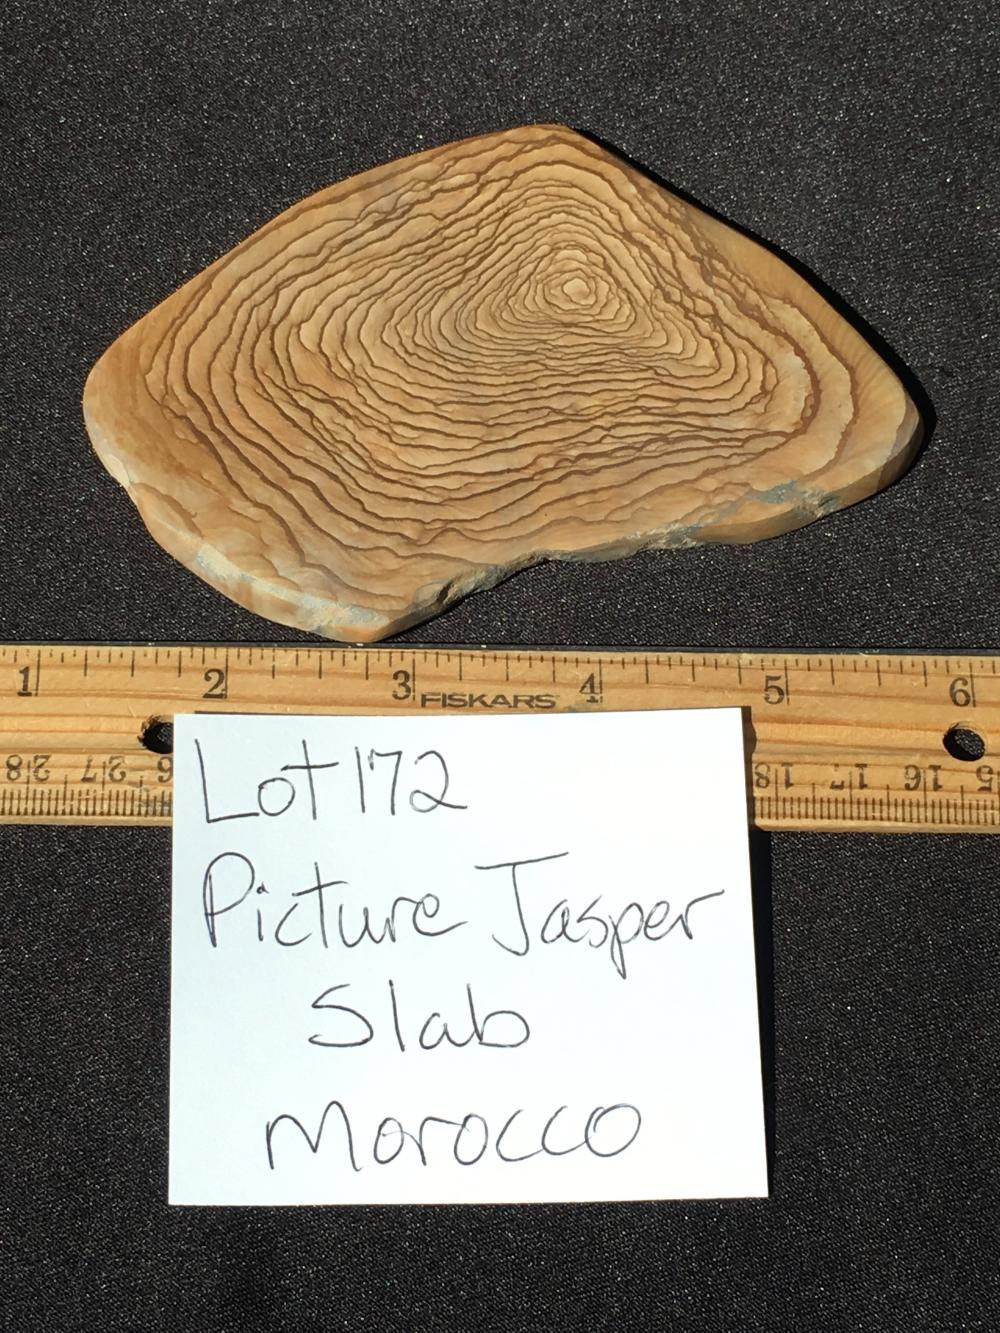 Lot 172: Jasper, Rock, Crystal, Natural, Décor, Collectible, Slab